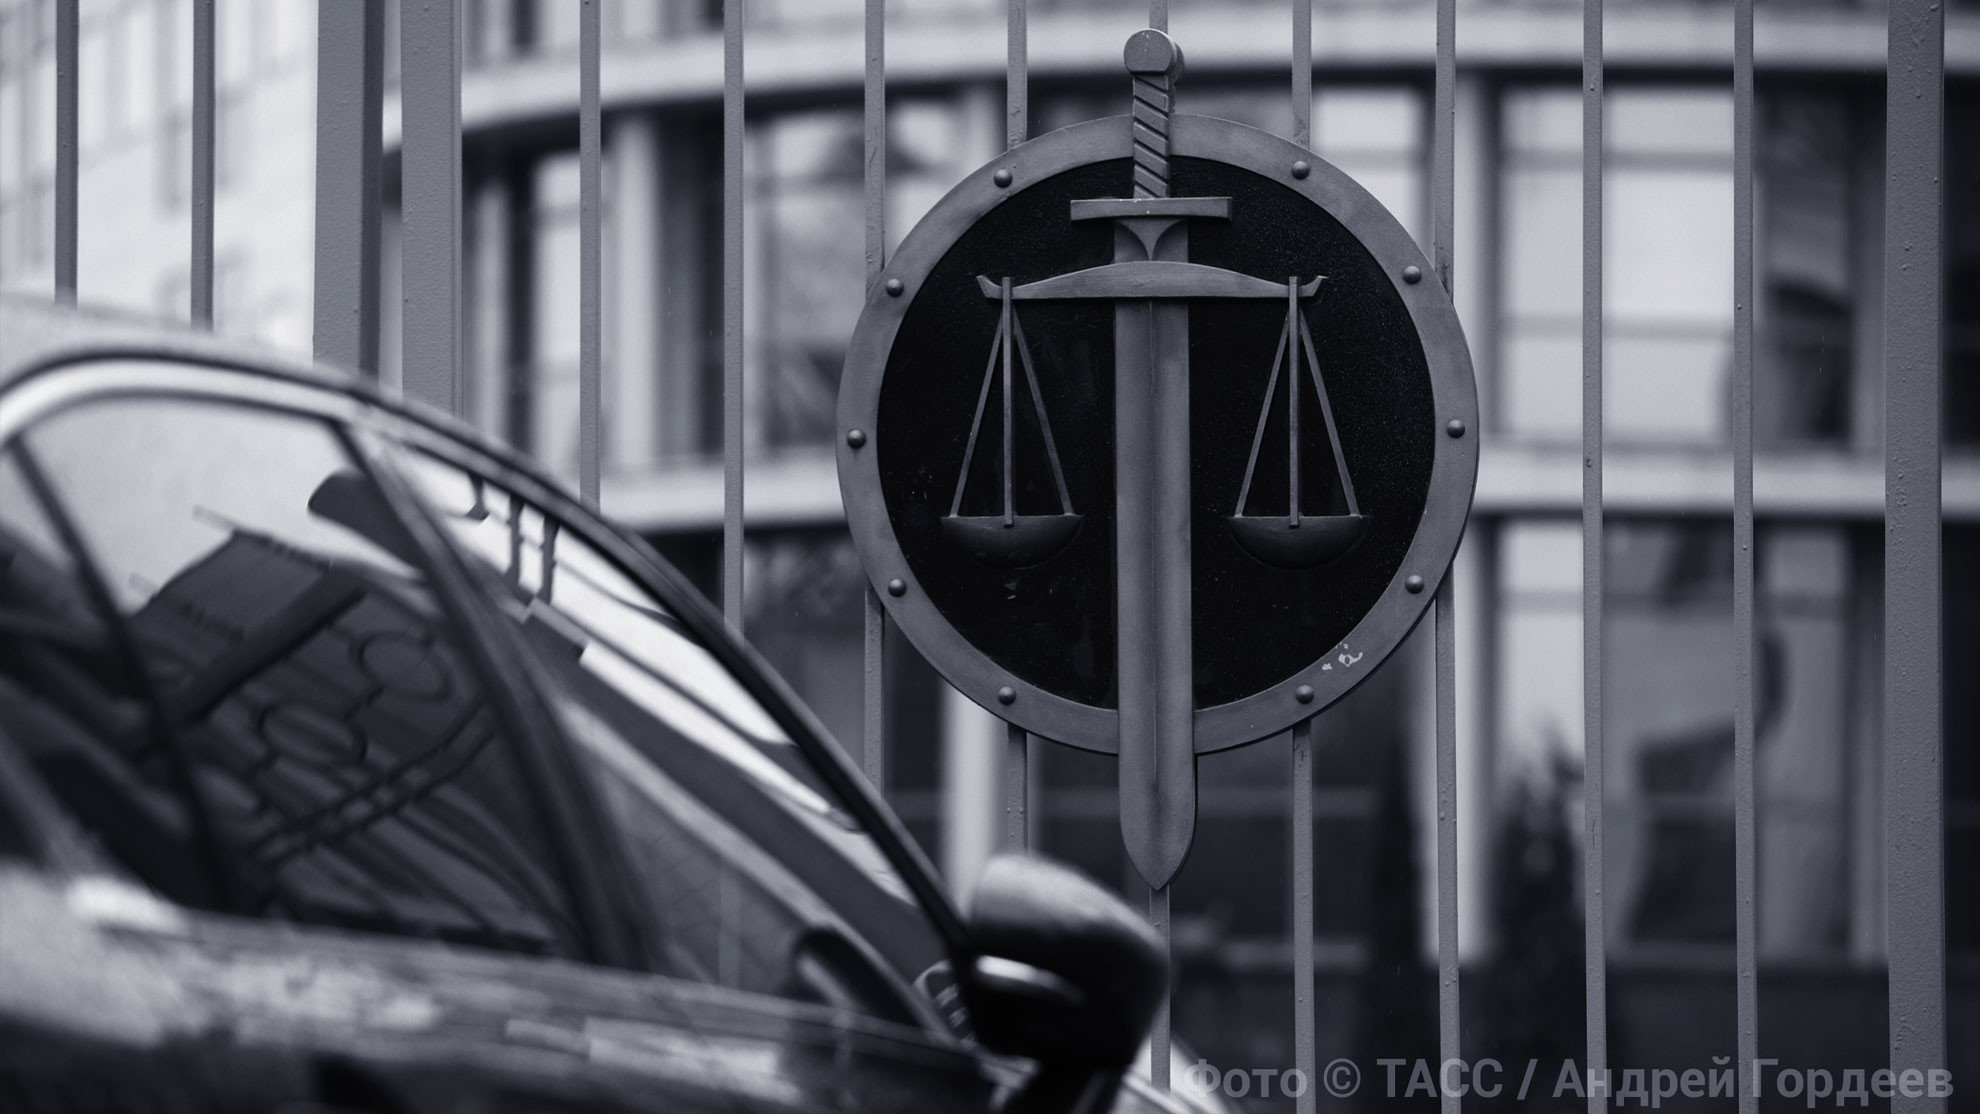 Ооо автоломбард суперломбард автосалоны москвы фото цены